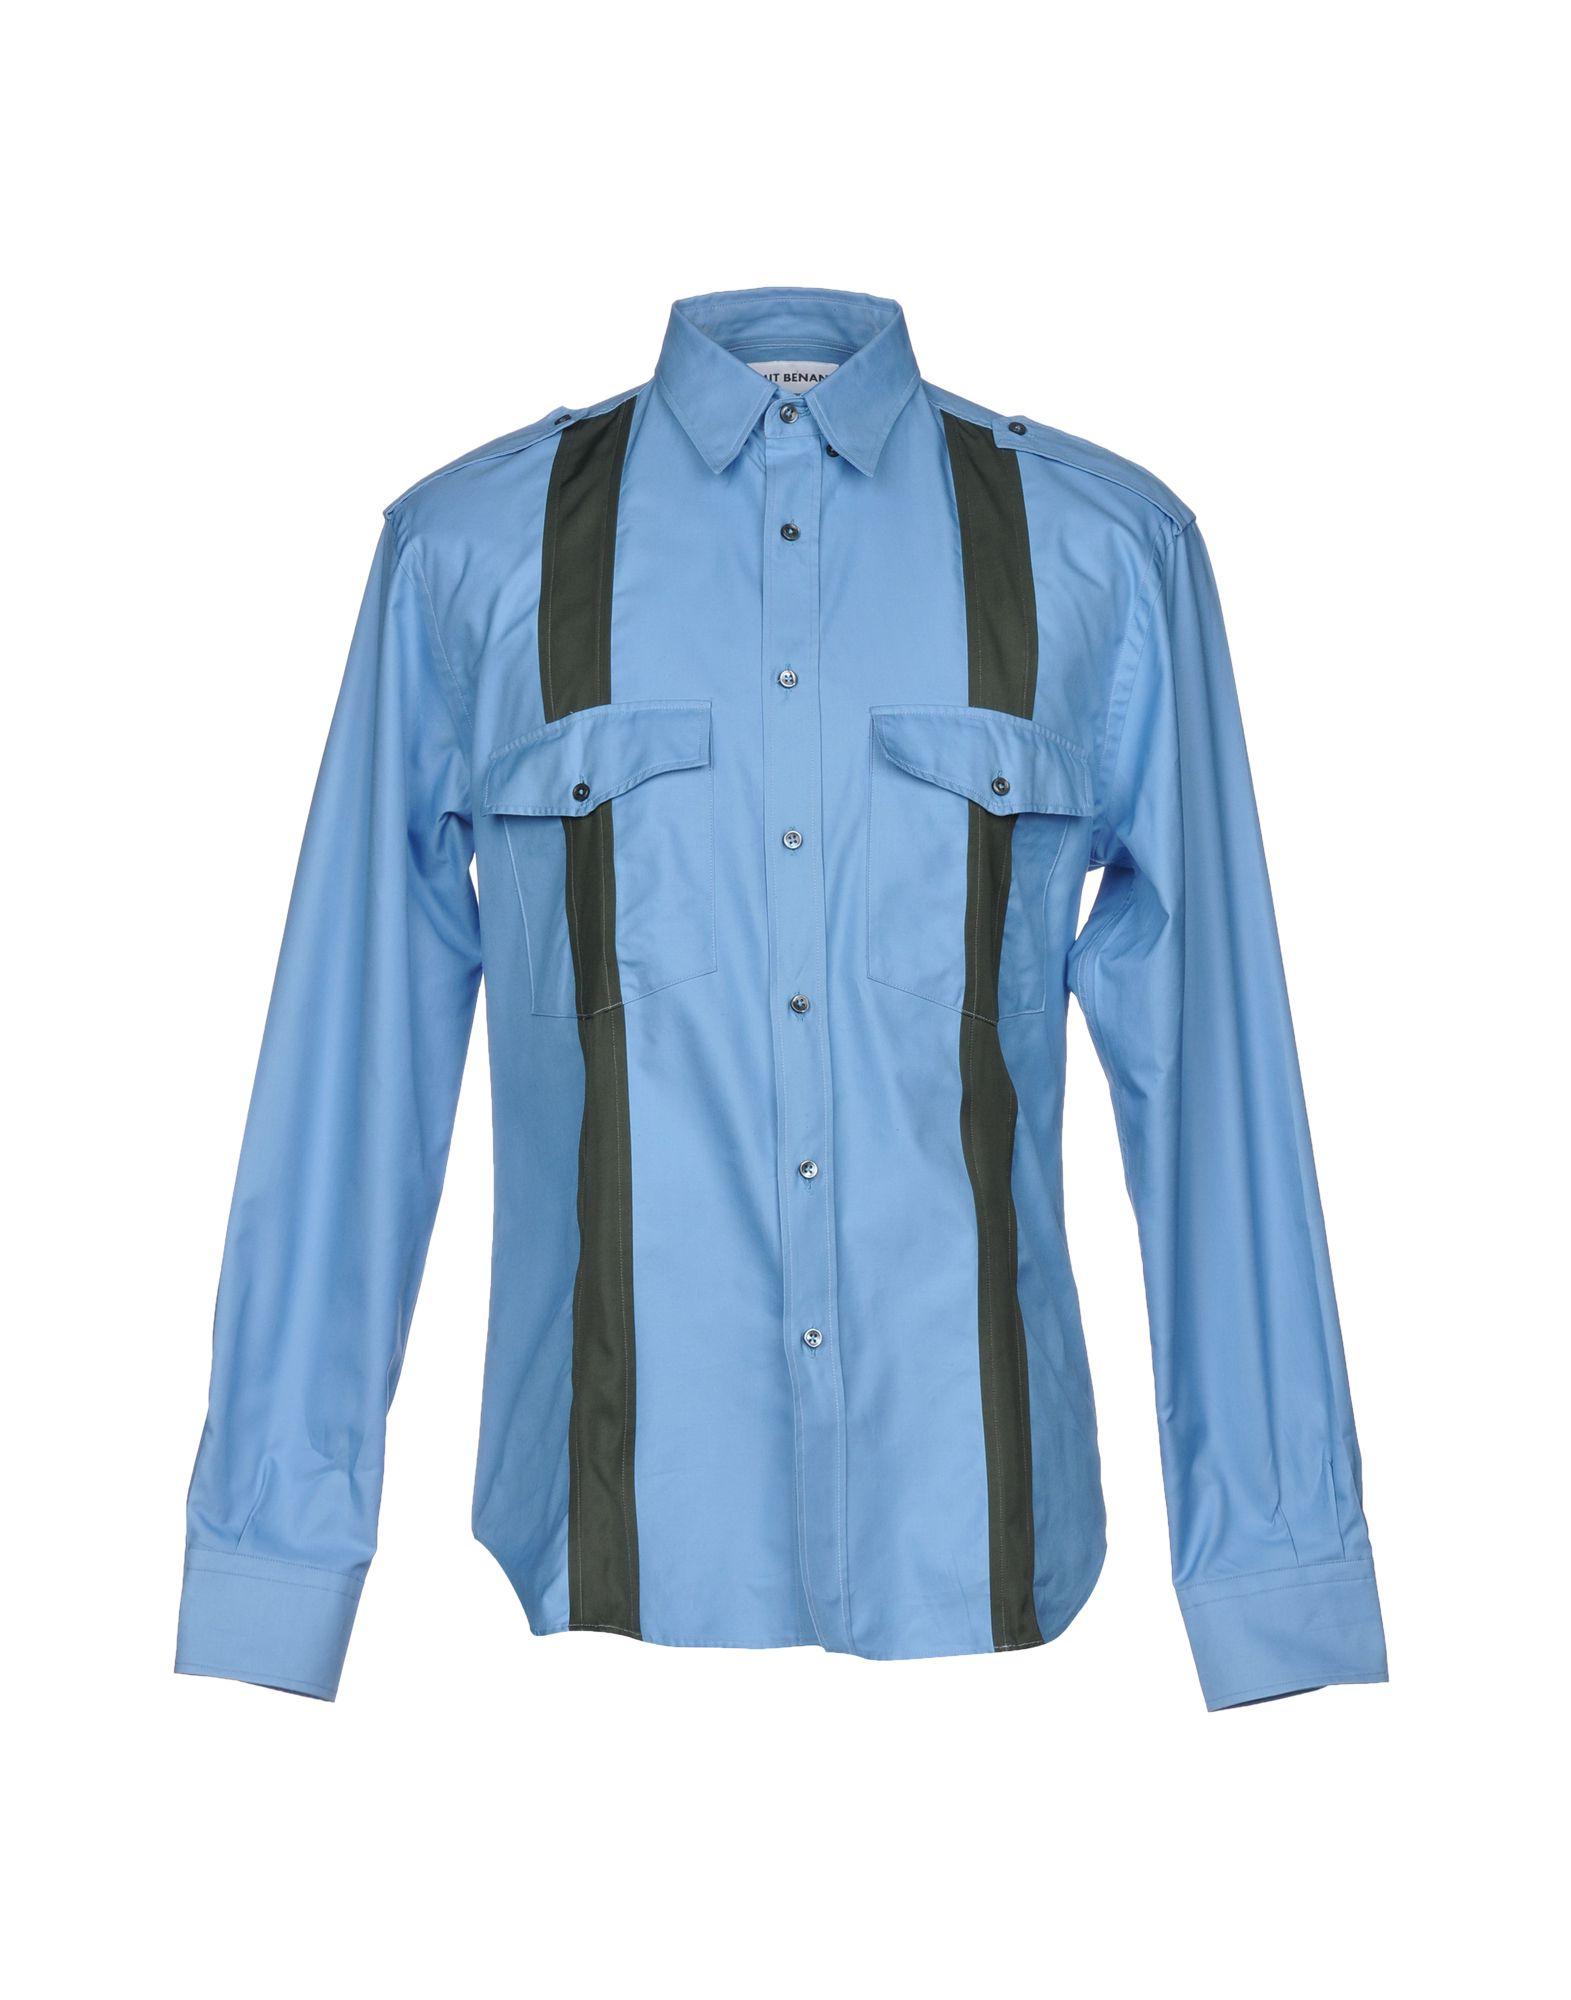 Camicia Fantasia Umit Benan Donna - Acquista online su